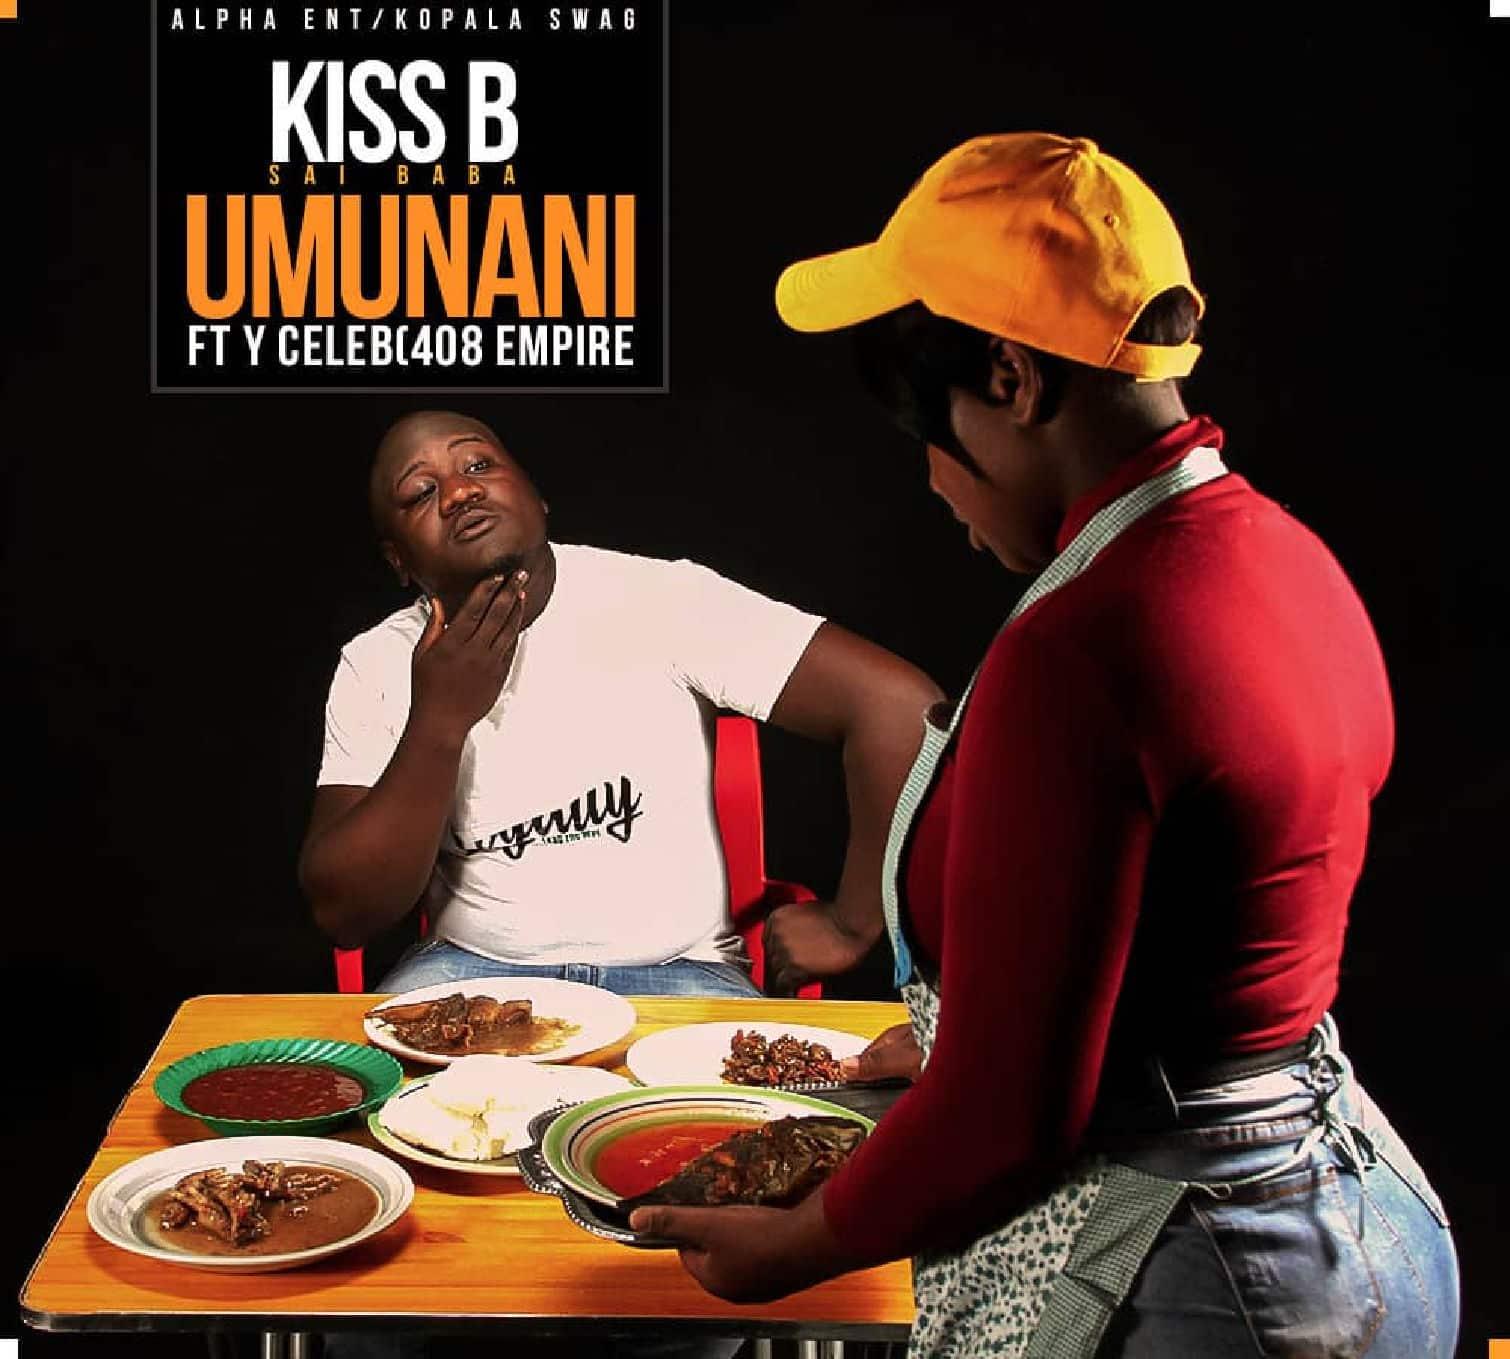 Kiss B Sai Baba Ft. Y Celeb Umunani